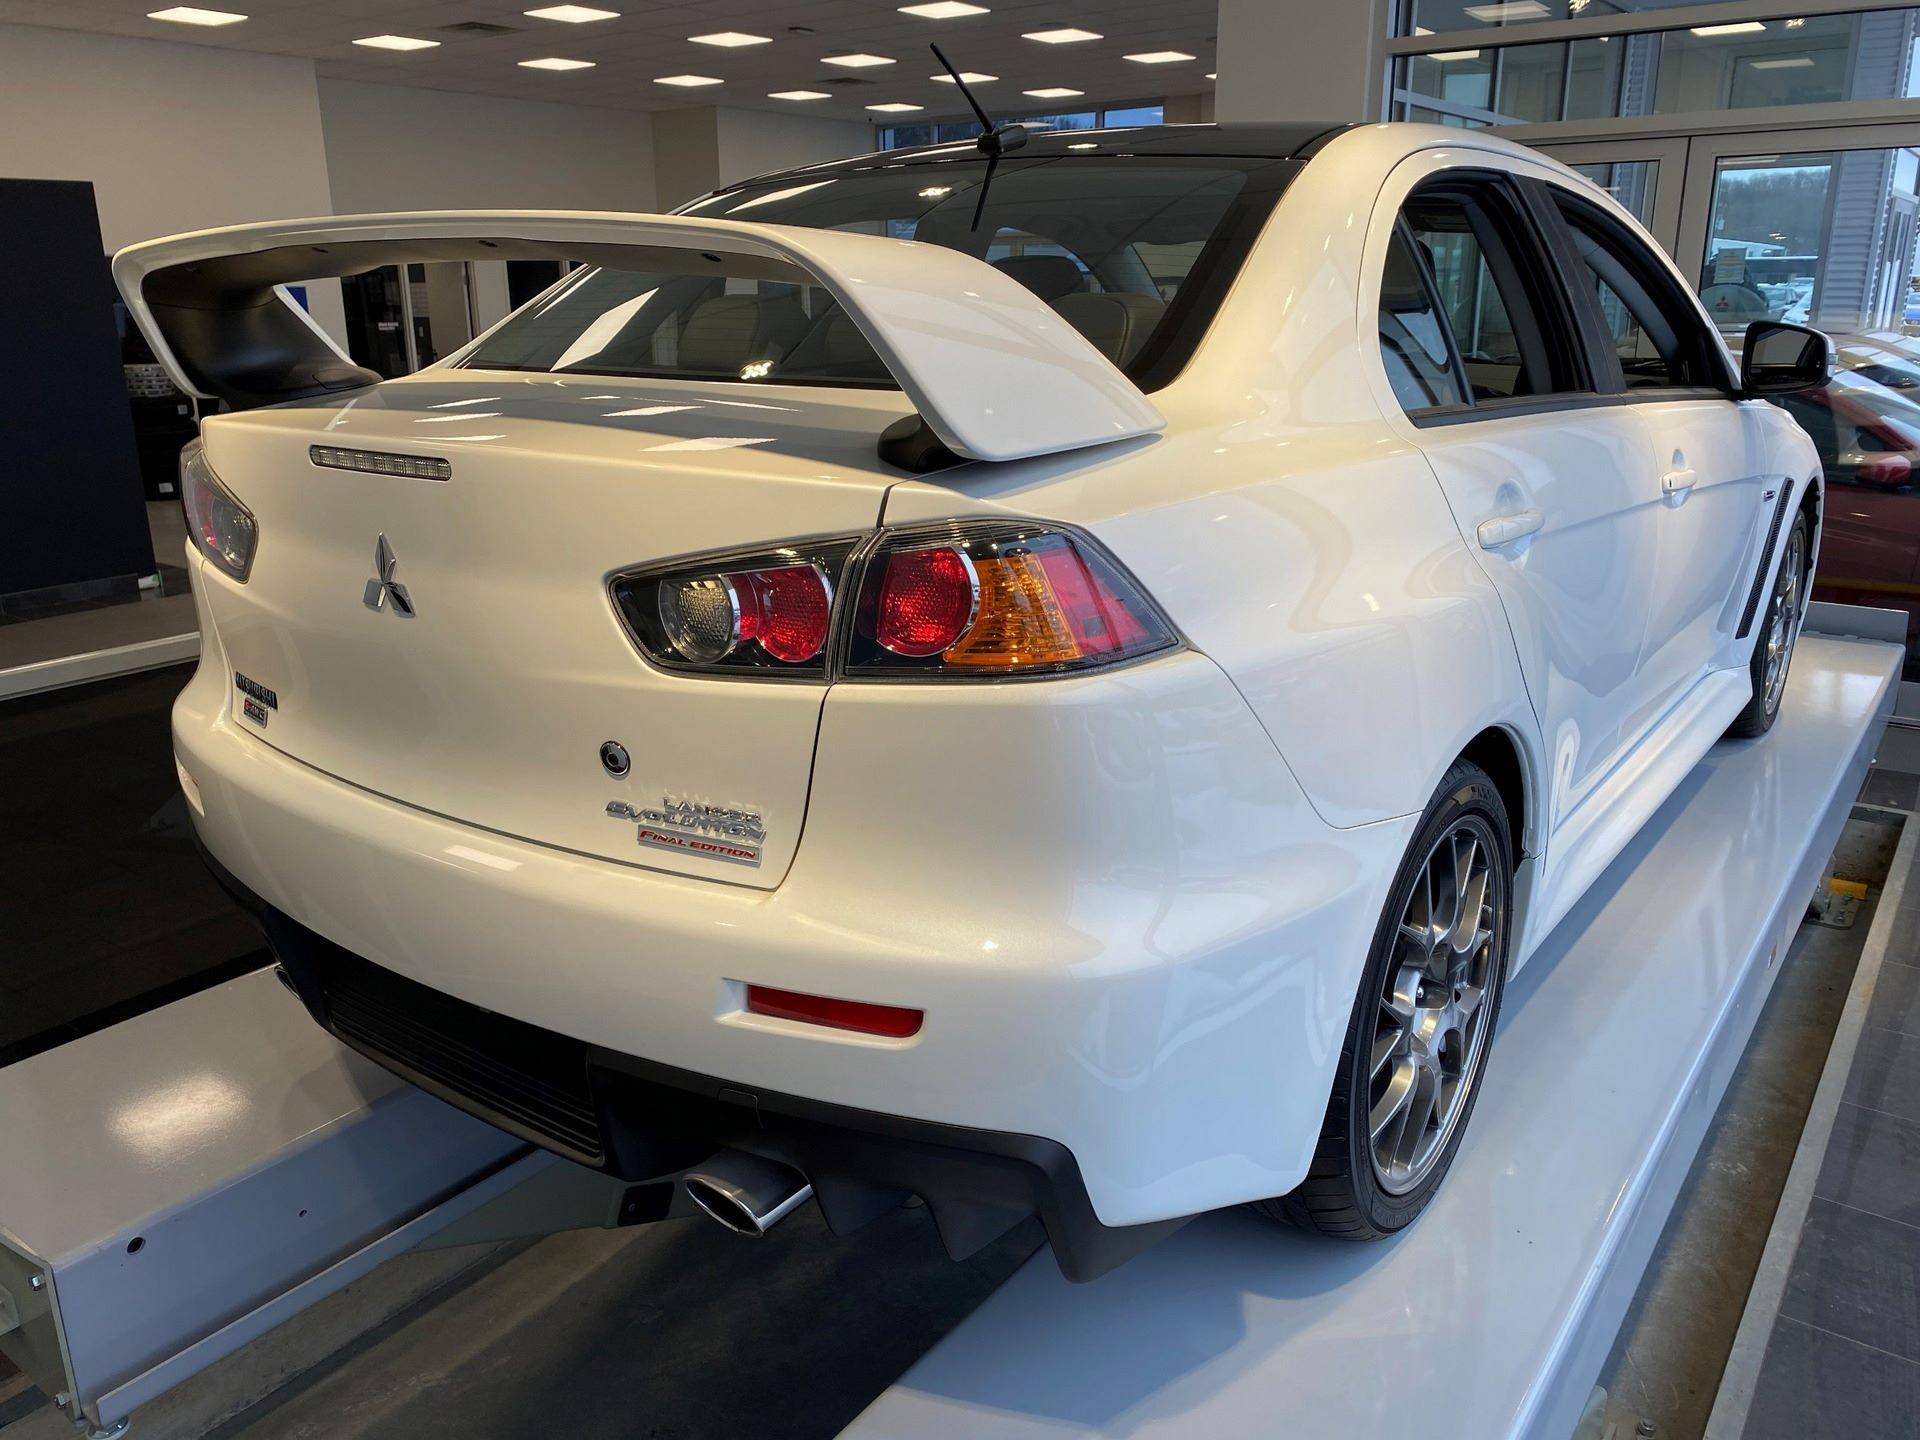 Mitsubishi-Lancer-Evo-Final-Edition-for-sale-5